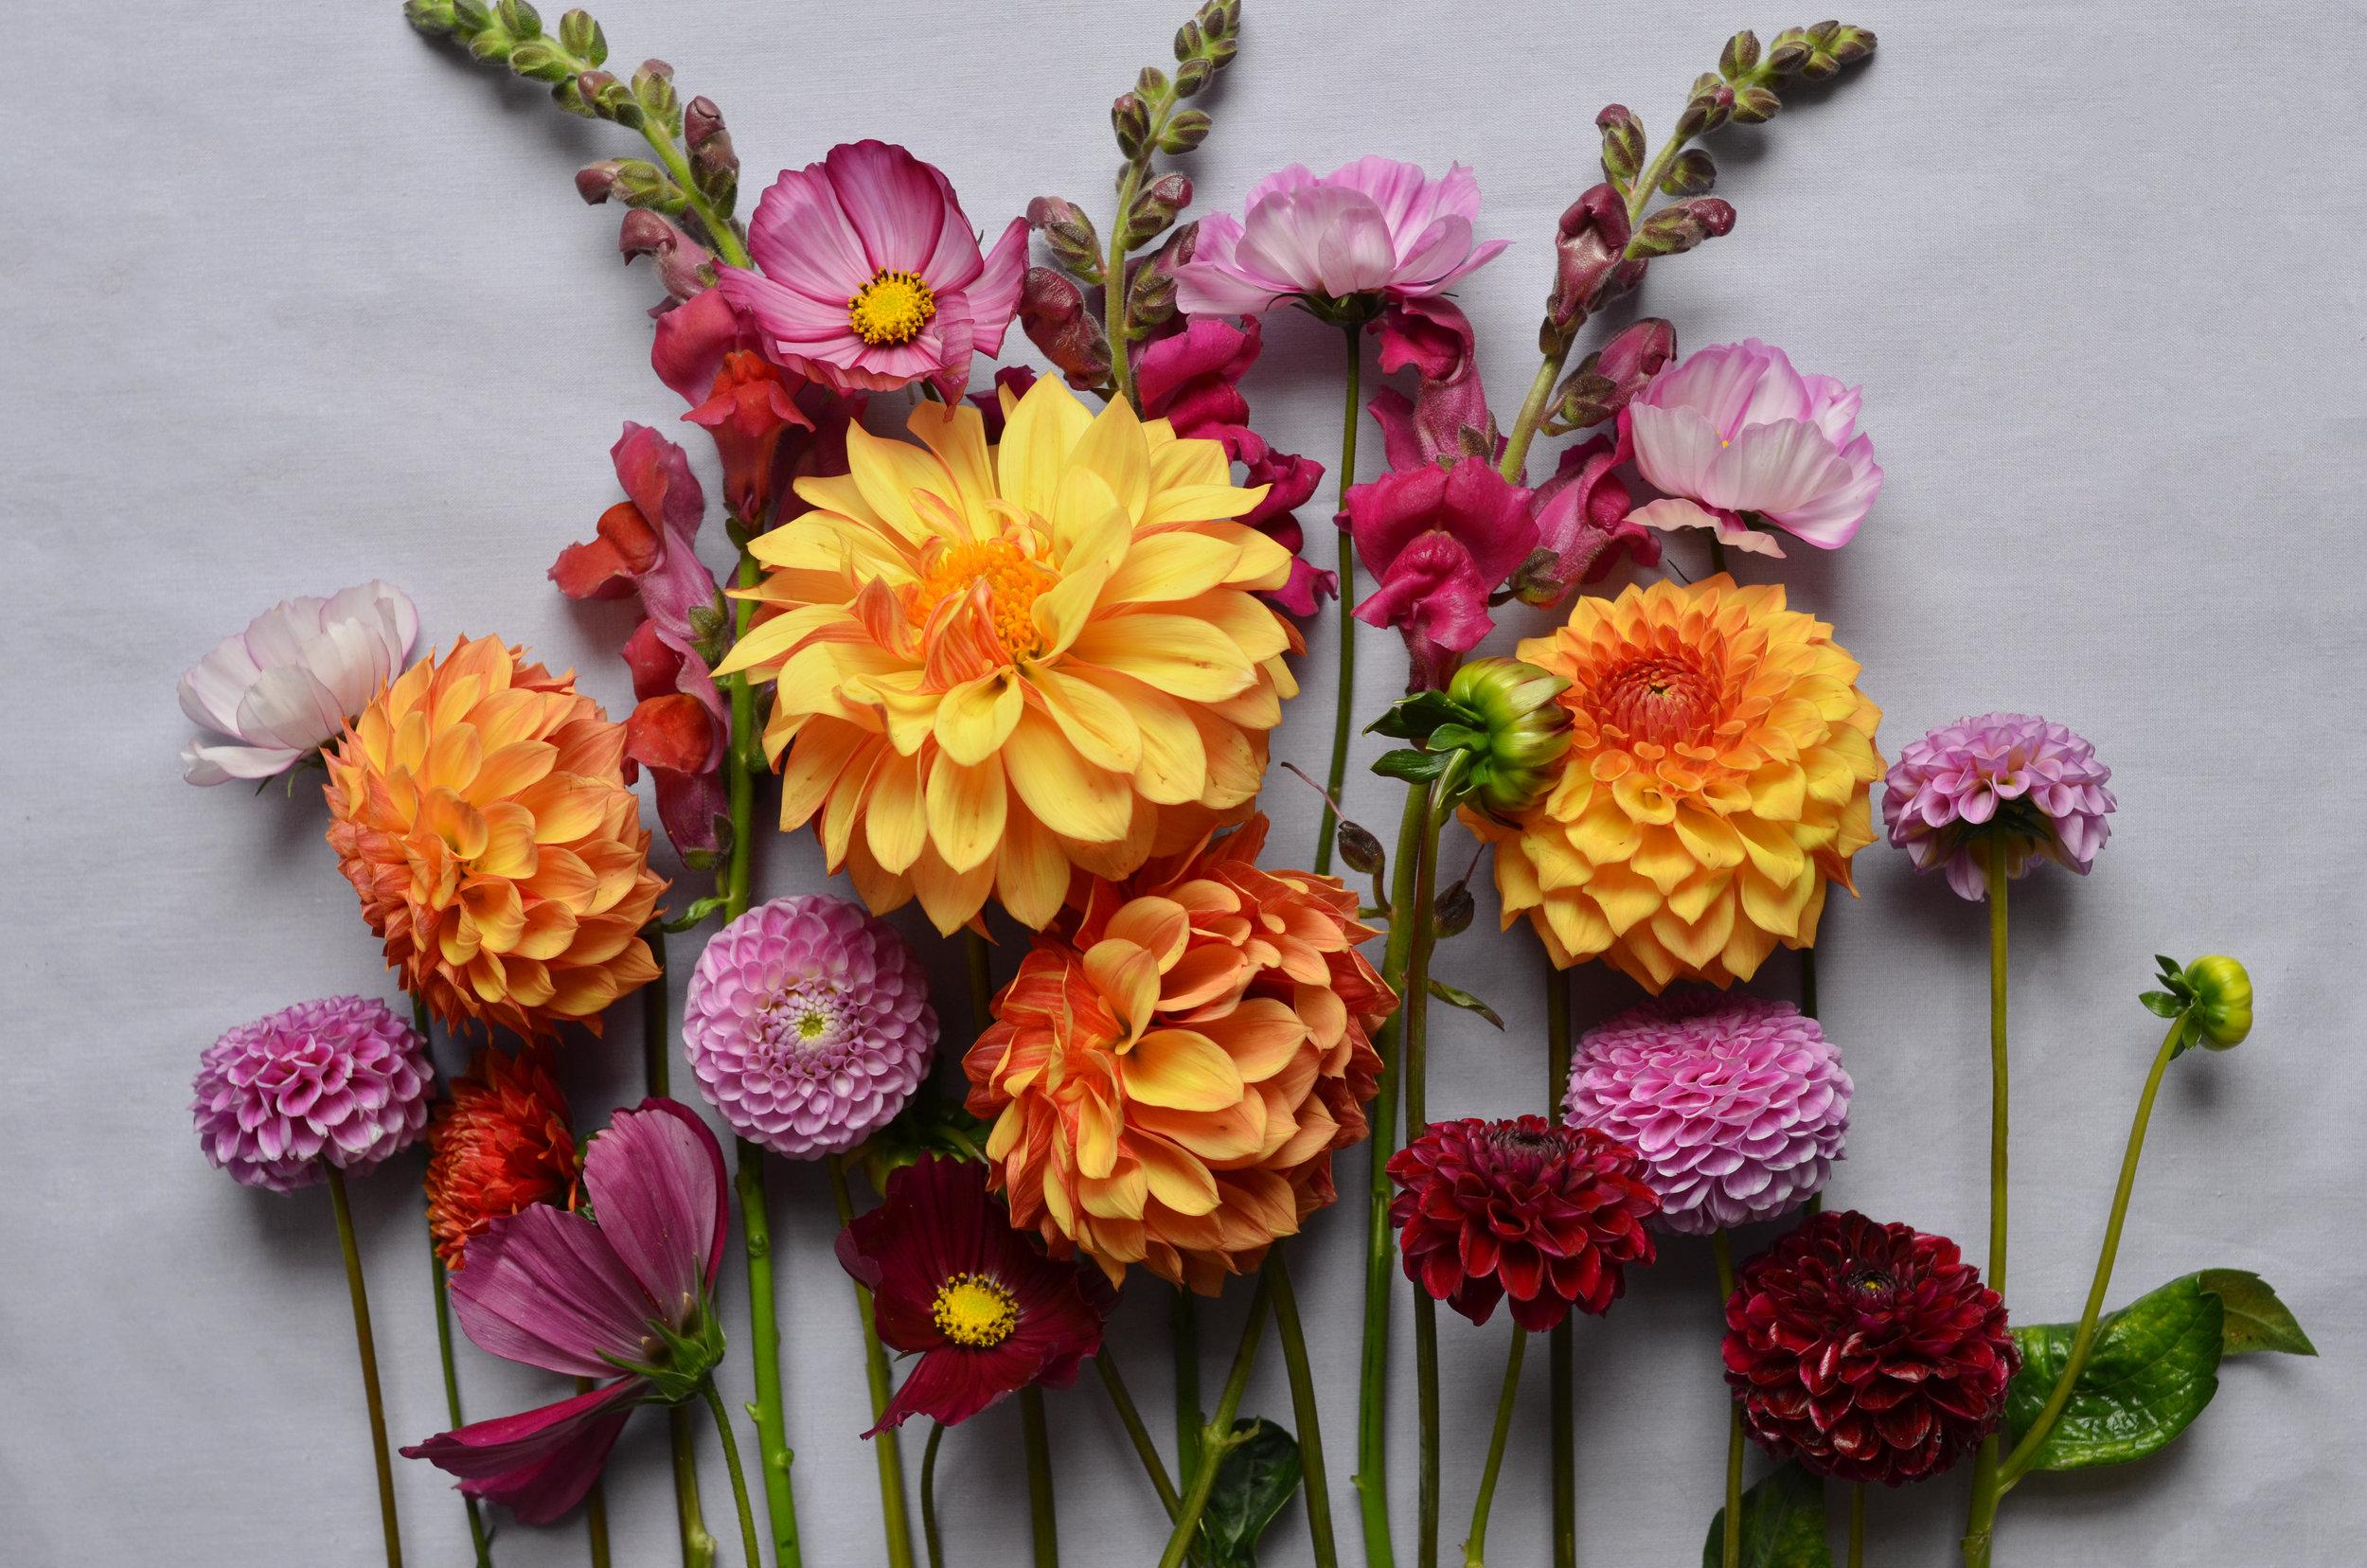 Locally grown Fort Collins flower mix. Dahlias. Zinnas. Cosmos. Snapdragons.